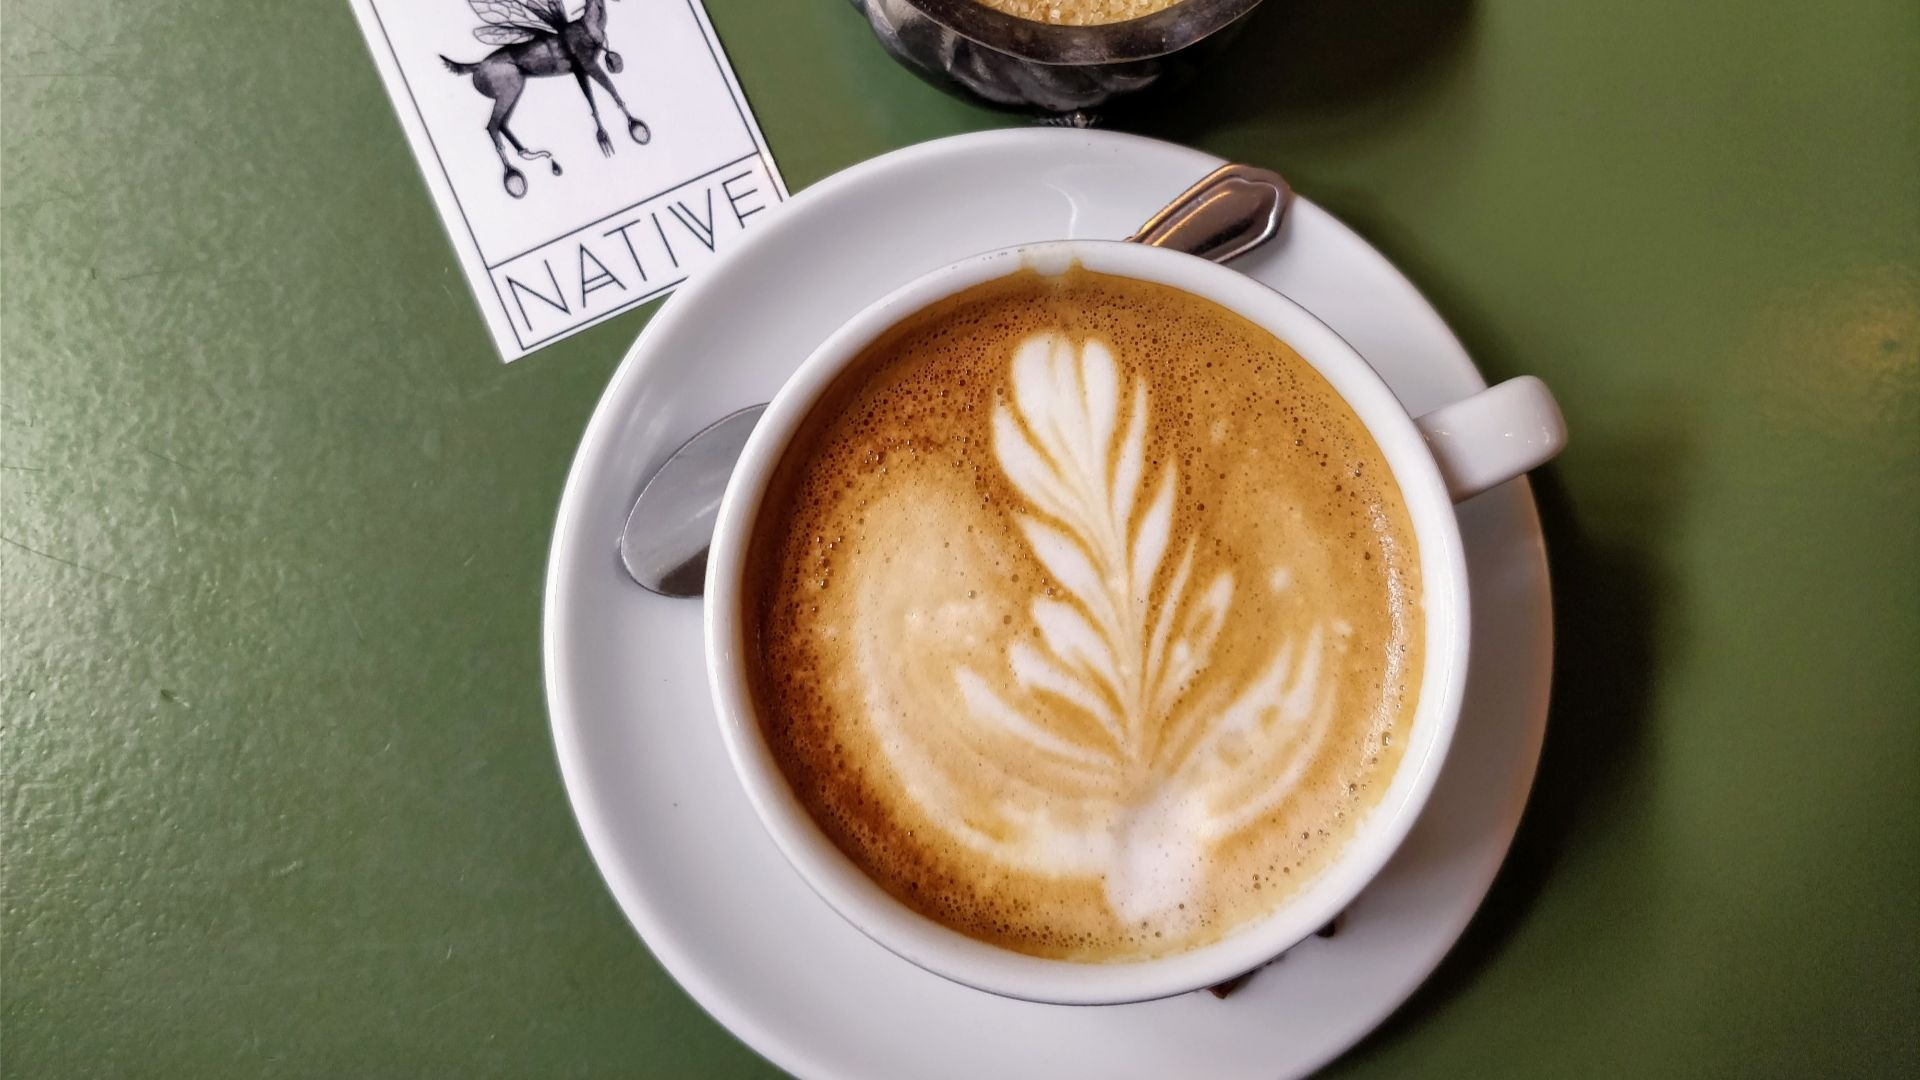 Best Coffee in Haarlem, The Netherlands